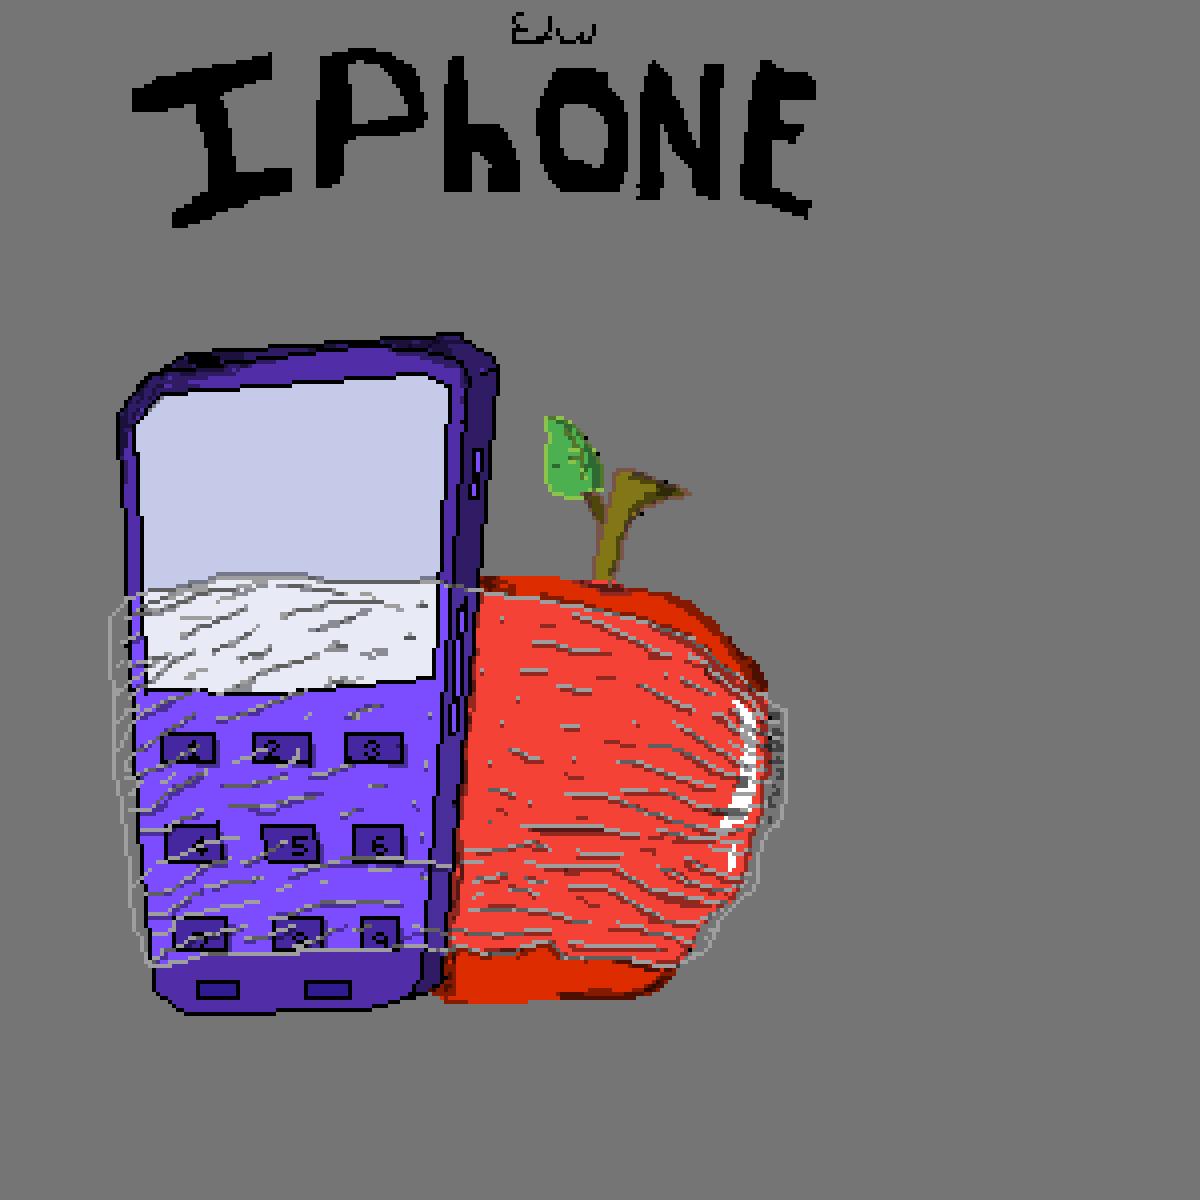 Iphone :v by edward